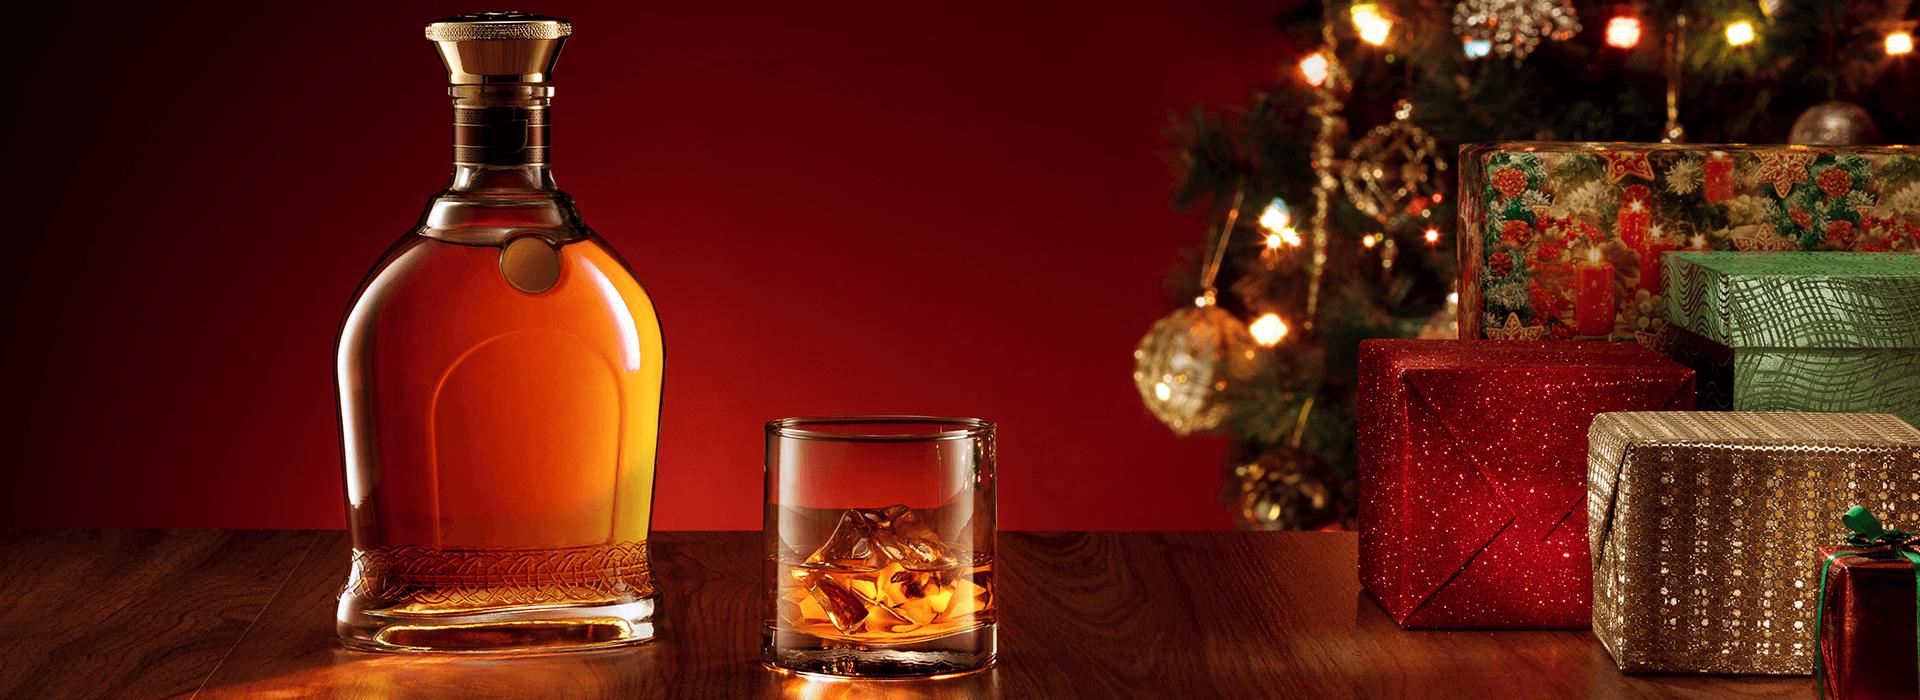 Liquor Only Gift Baskets USA